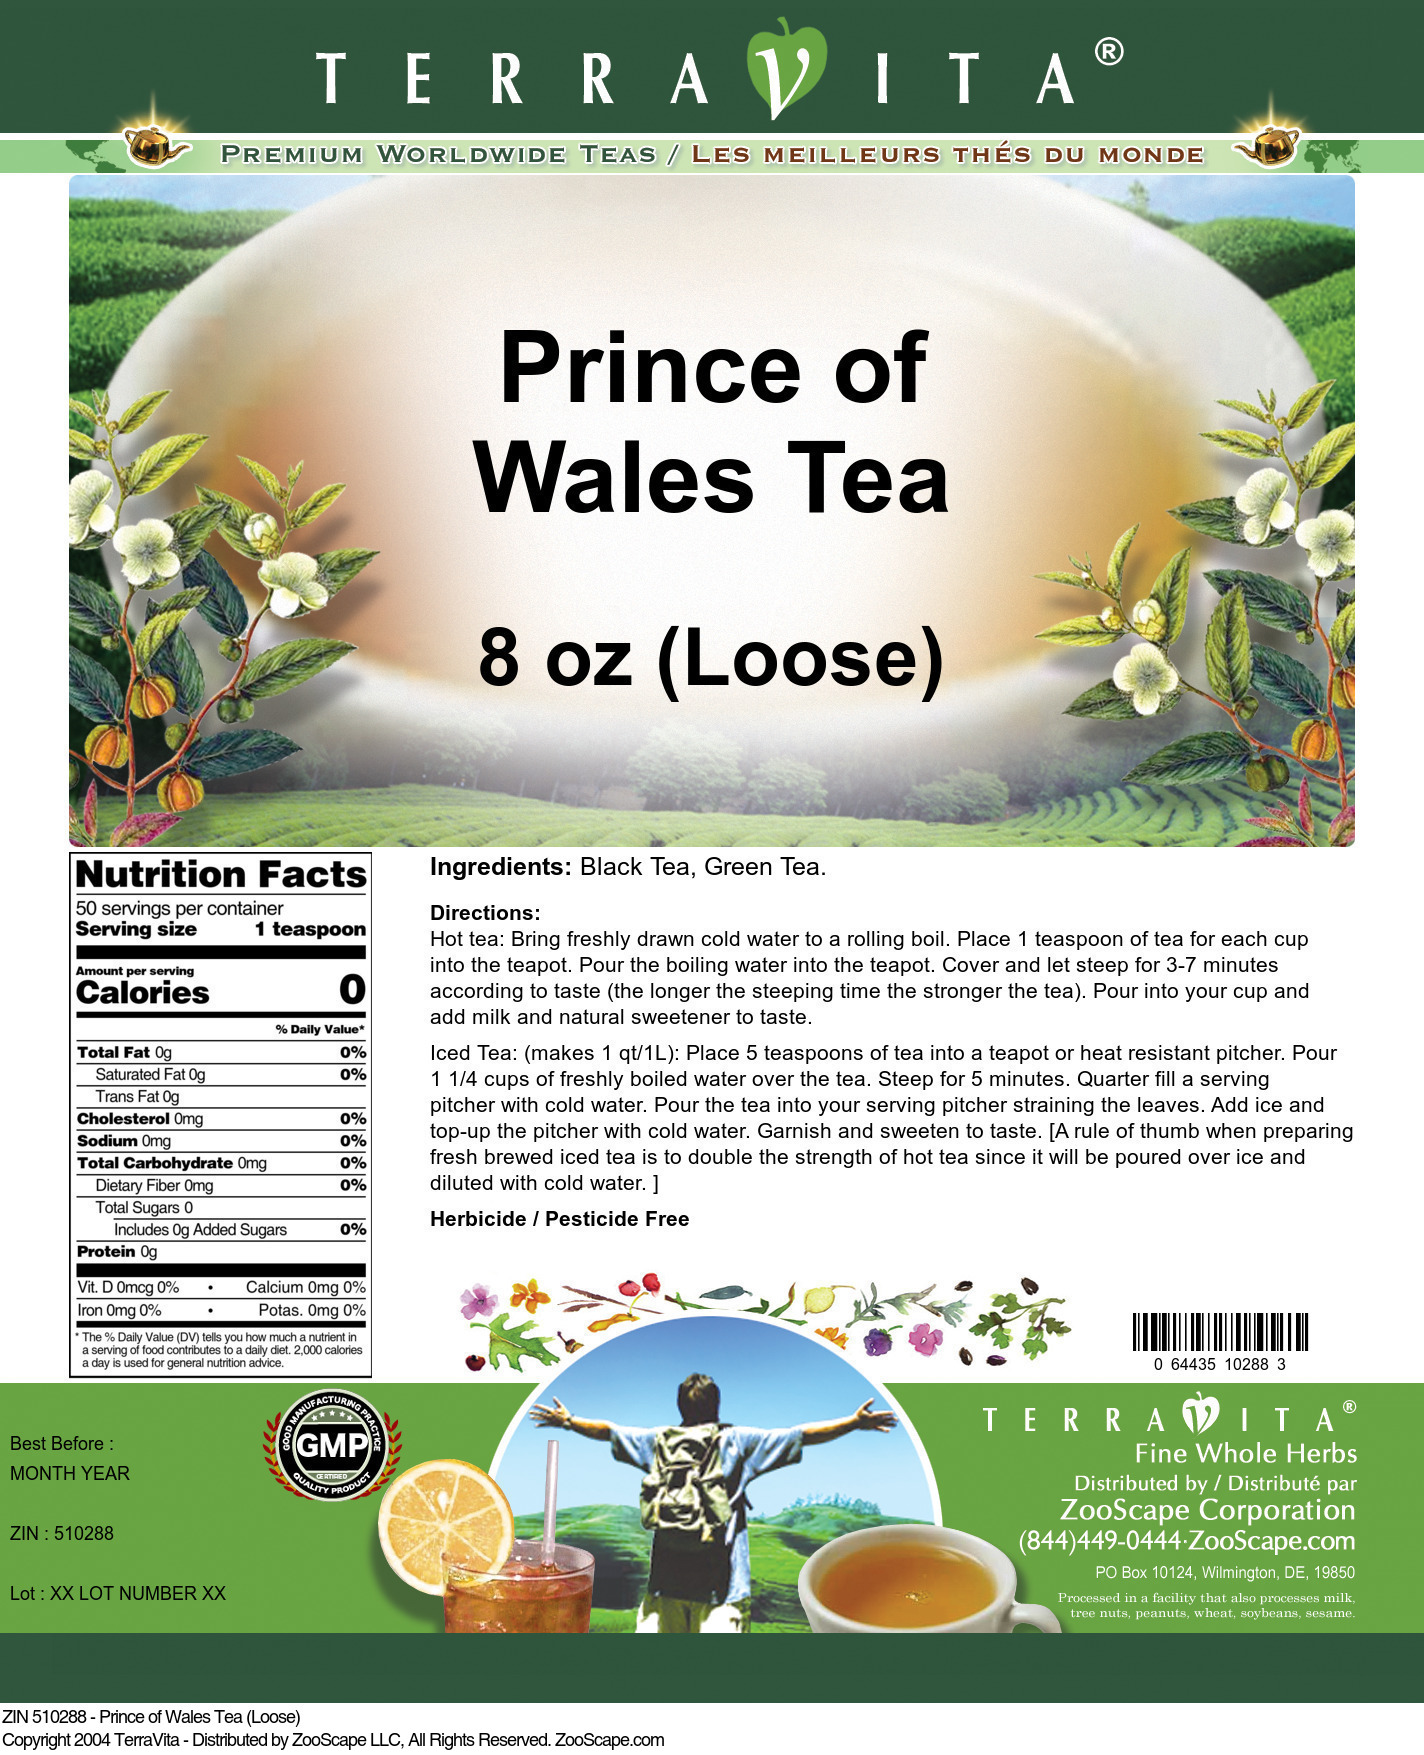 Prince of Wales Tea (Loose)